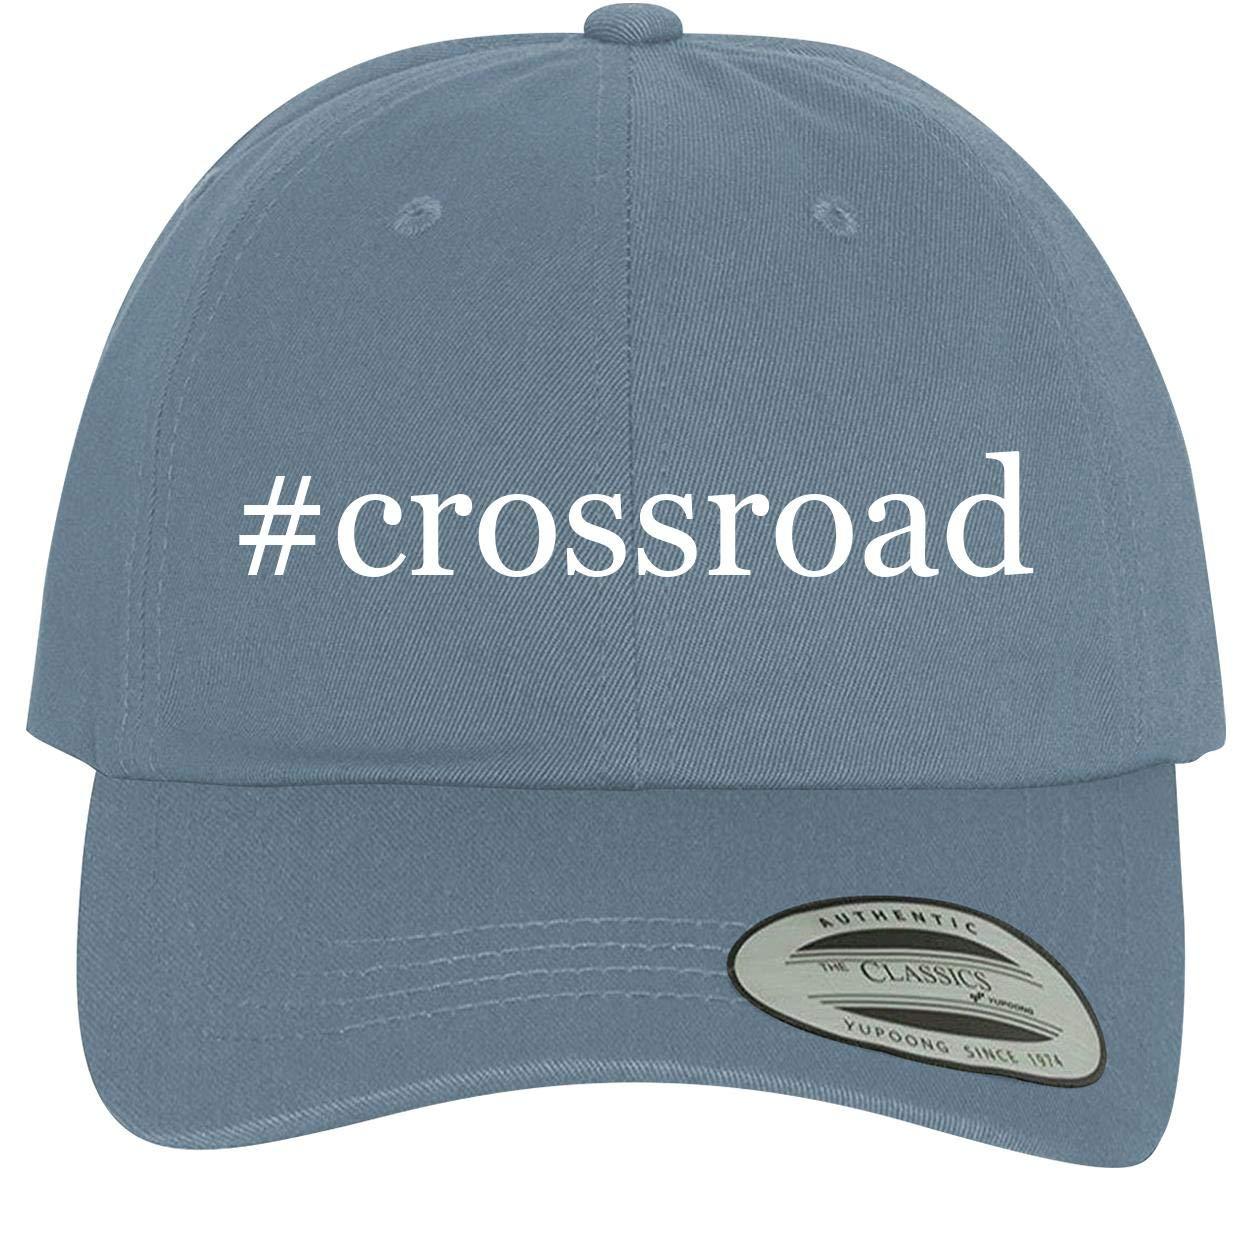 Comfortable Dad Hat Baseball Cap BH Cool Designs #Crossroad